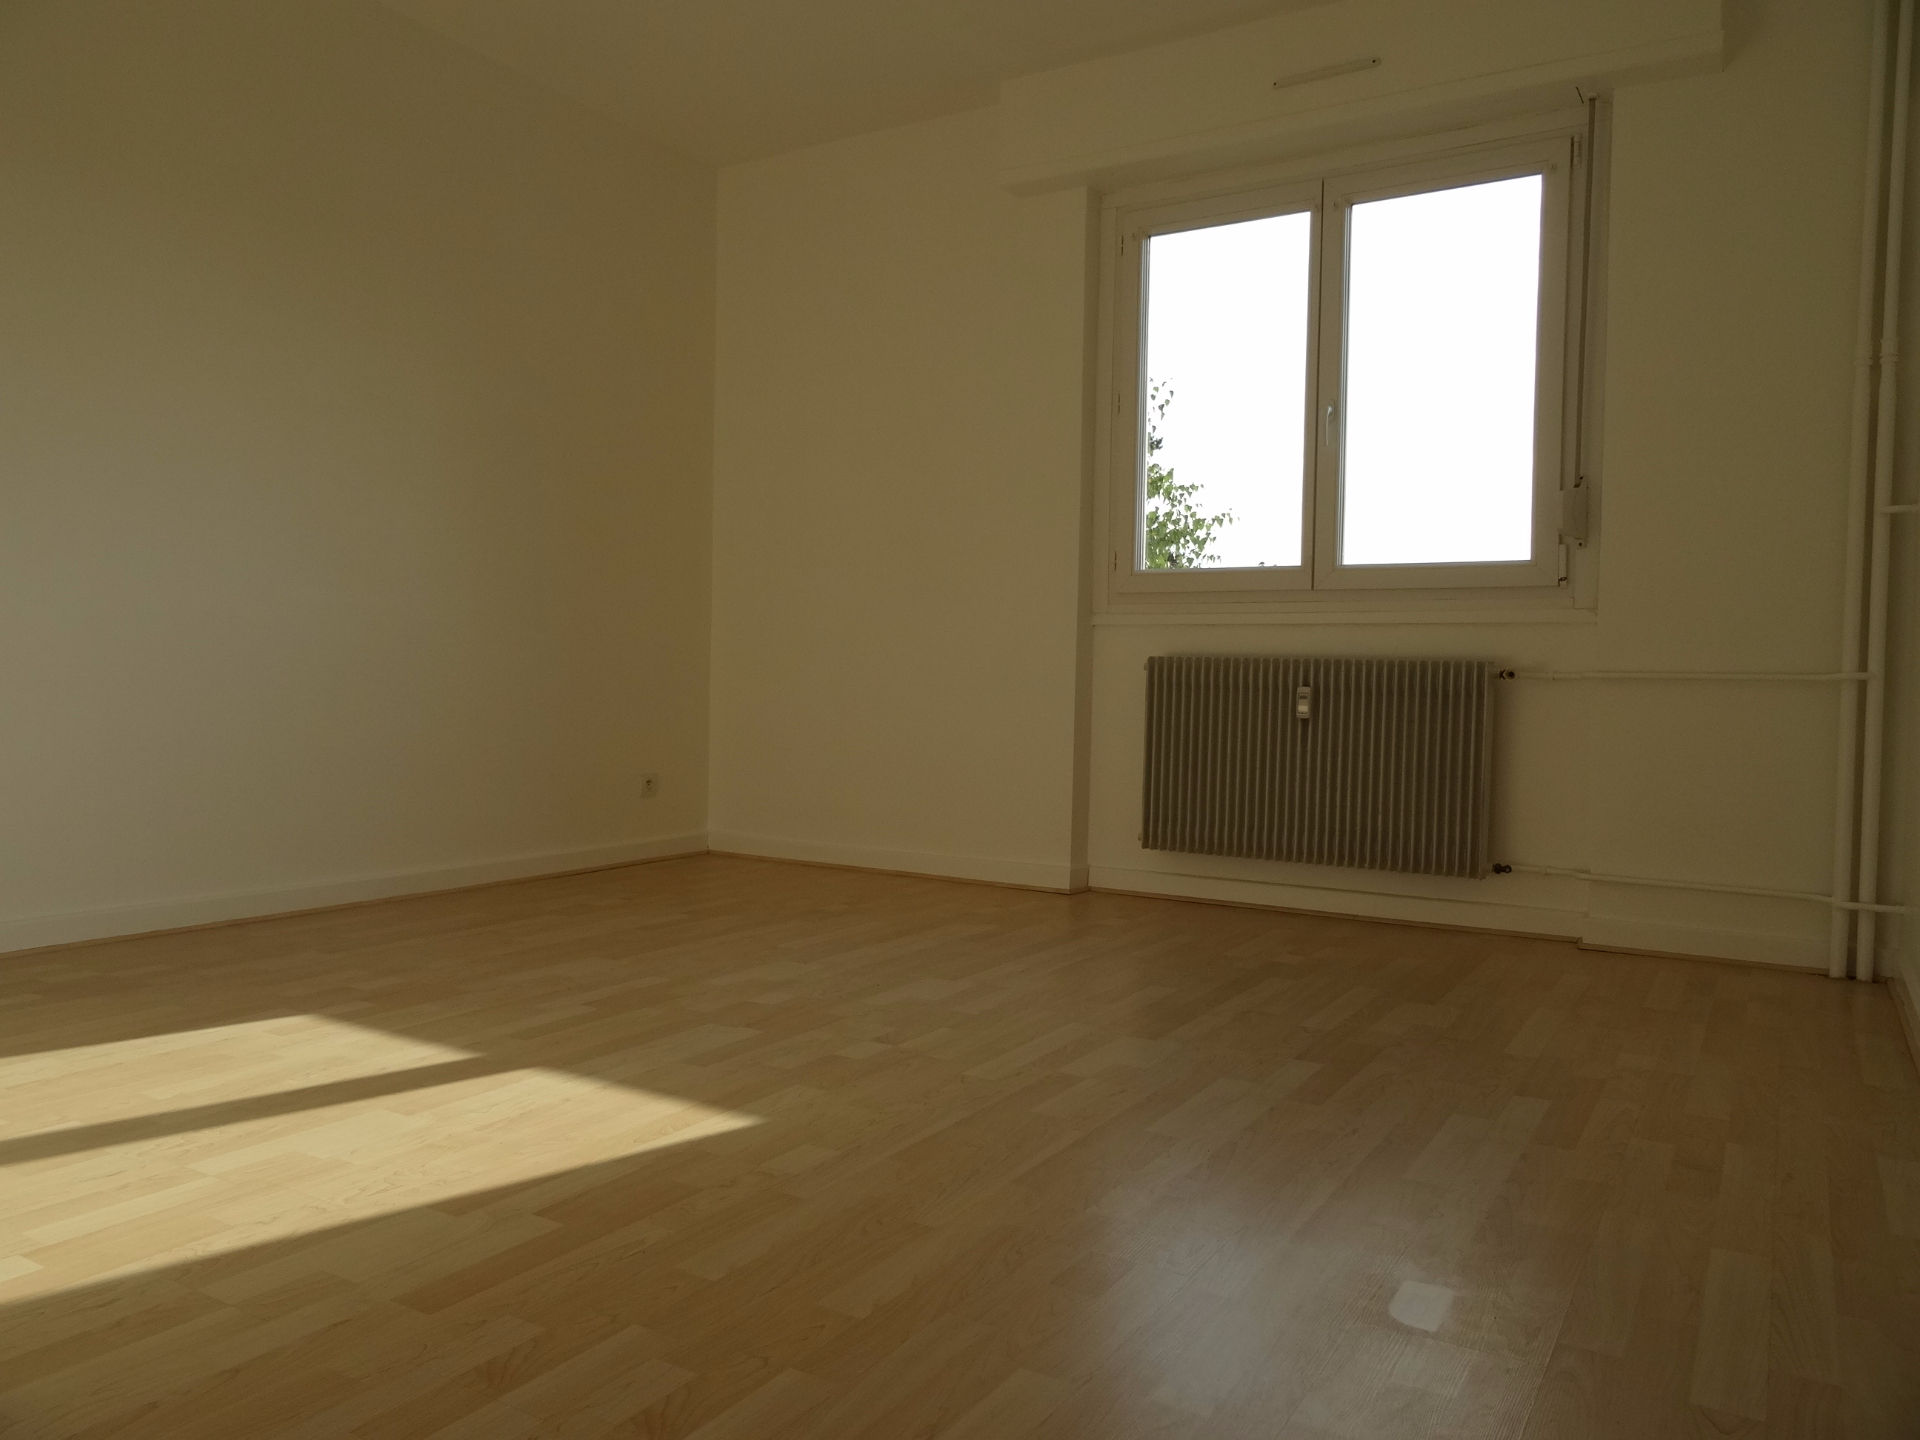 appartement louer caen vide ou meubl. Black Bedroom Furniture Sets. Home Design Ideas